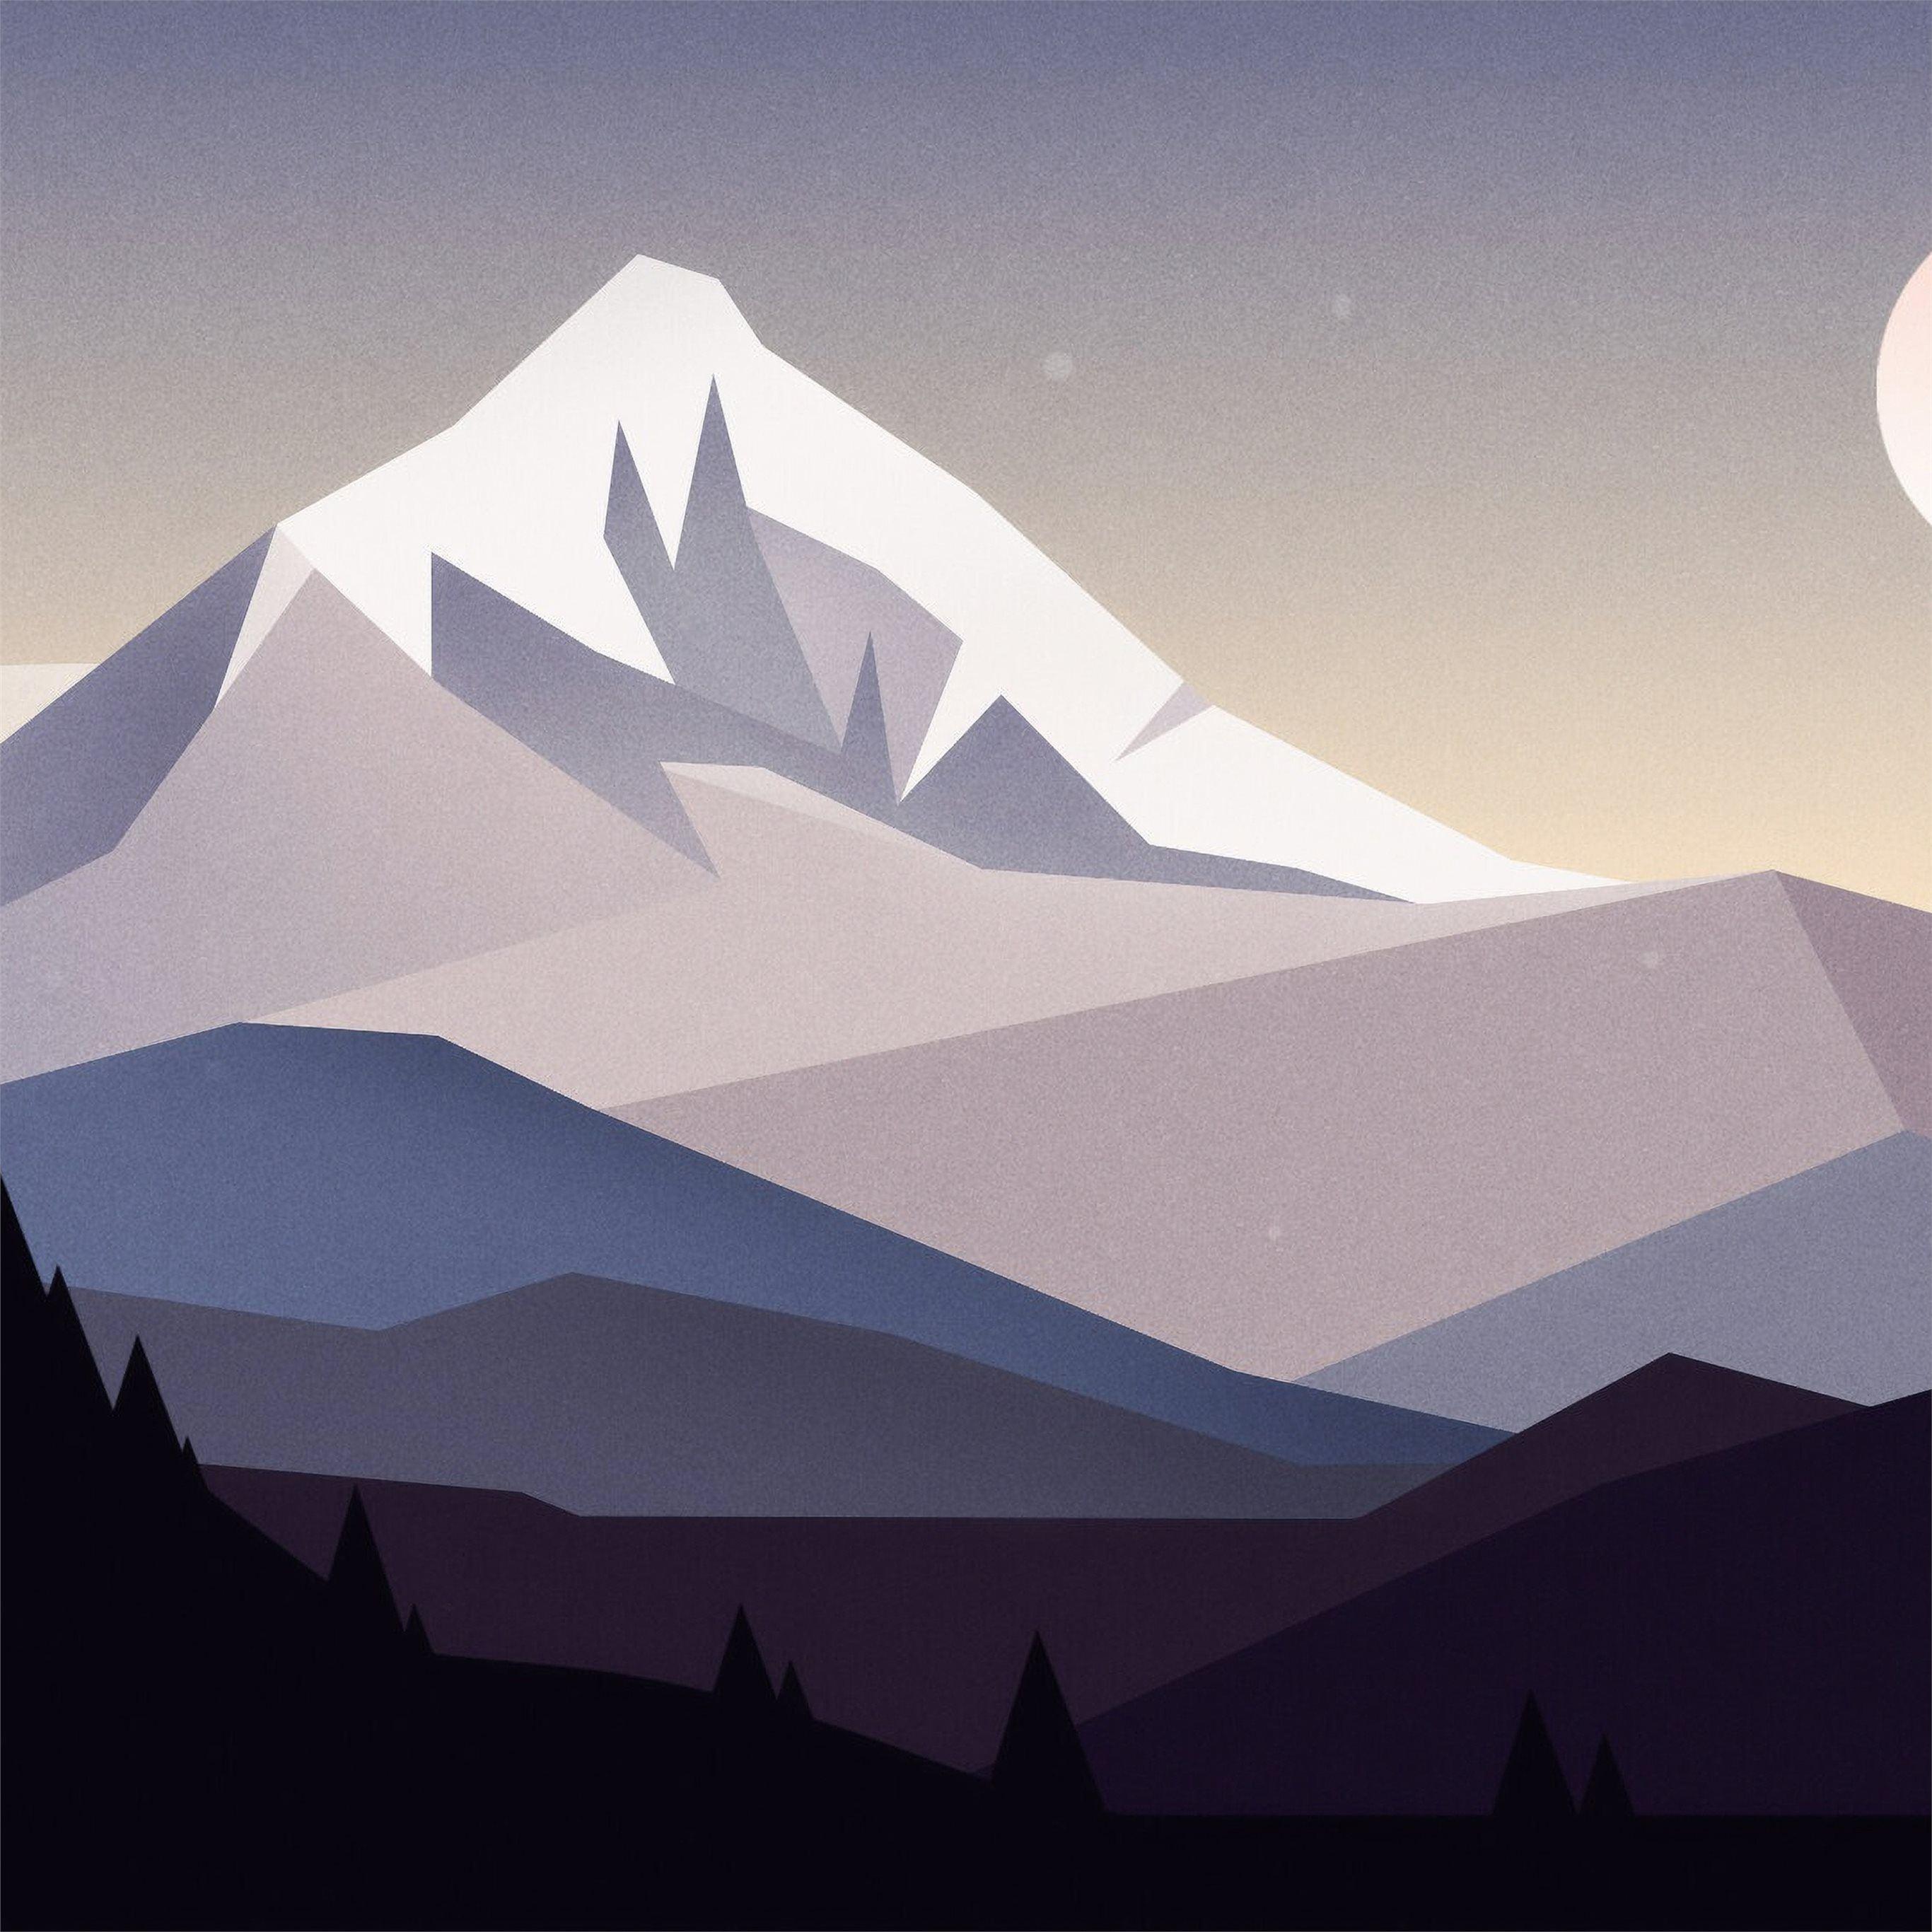 Best Mountains Ipad Pro Wallpapers Hd Ilikewallpaper